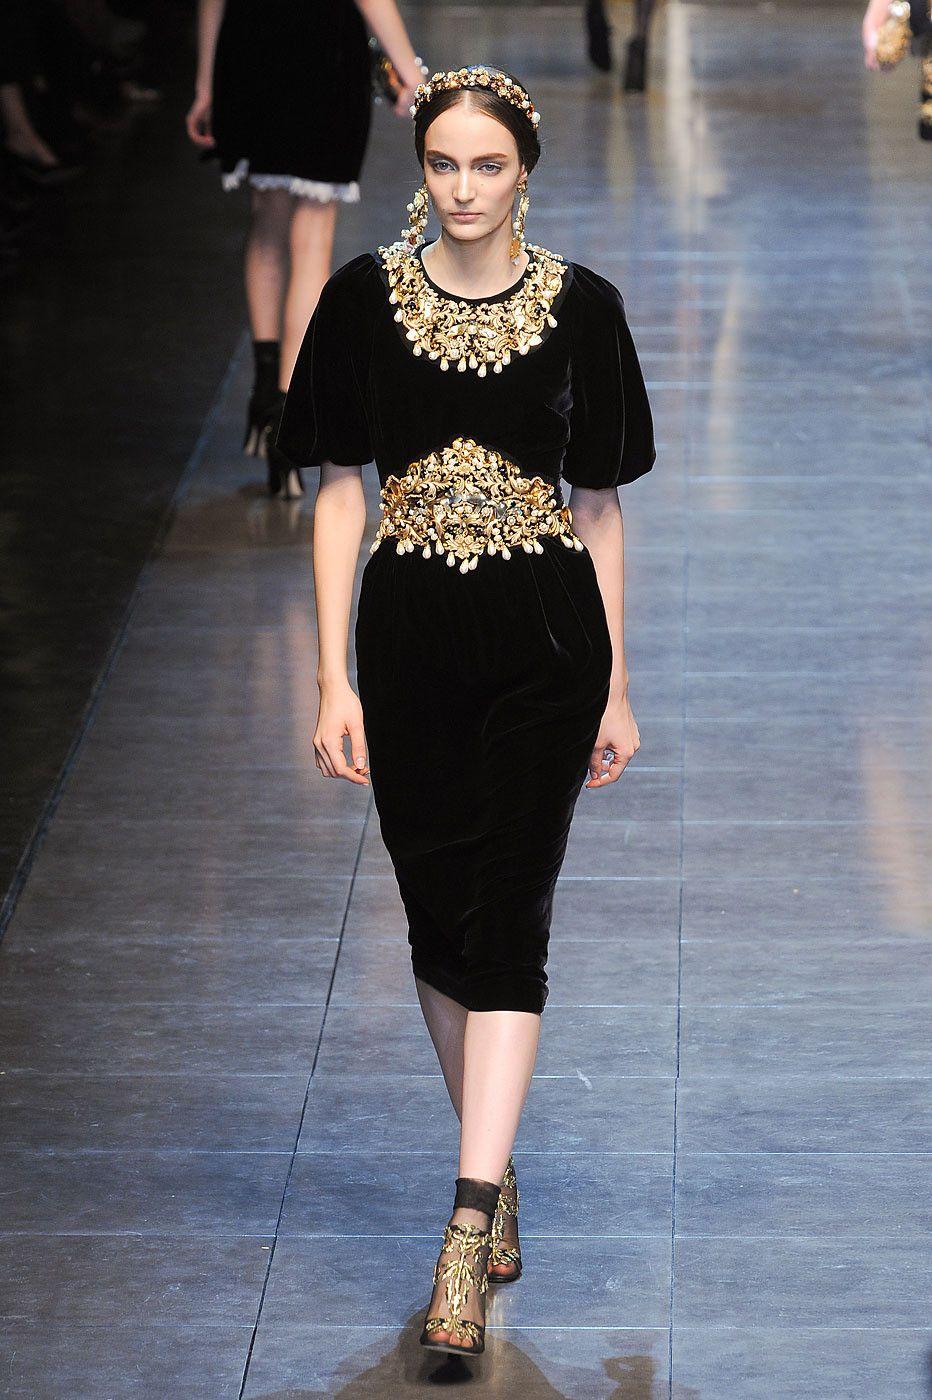 a1ba7ea24e5c Dolce & Gabbana at Milan Fashion Week Fall 2012 i 2019 | new